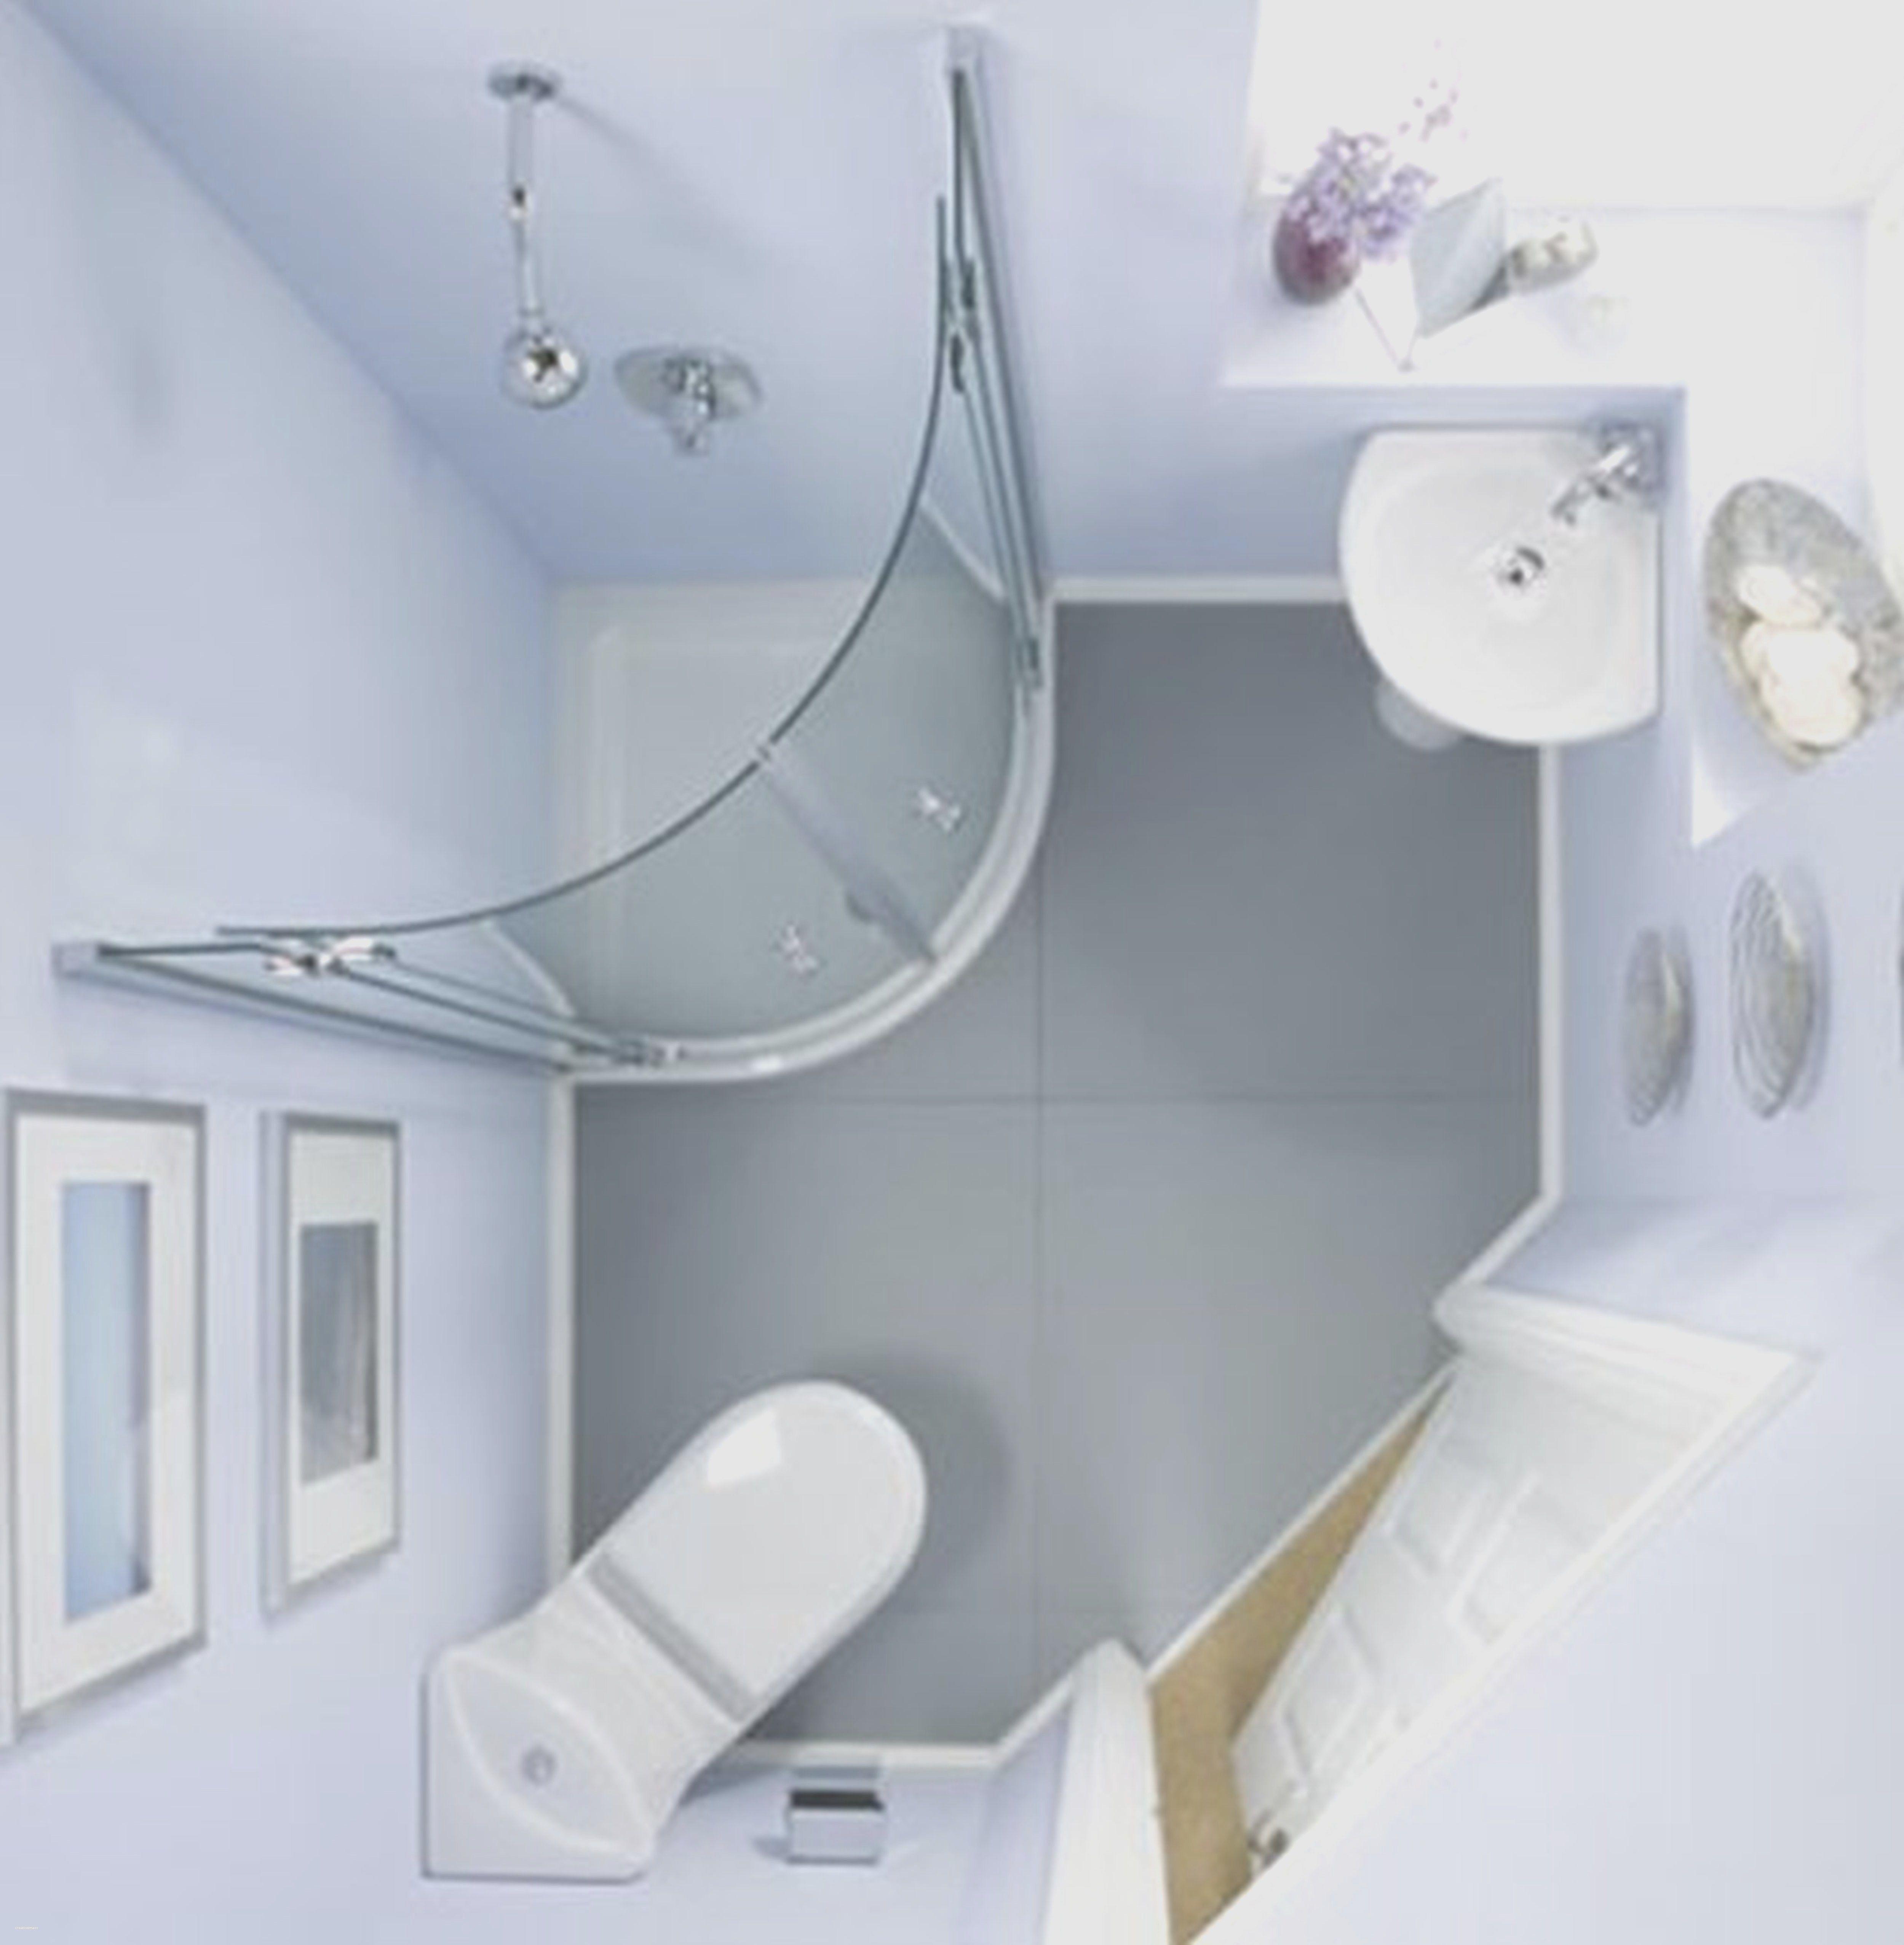 Very Small Ensuite Bathroom Ideas Bathroom Ideas Inside Really Small Bathroom Ideas Verysmallshowerroo Small Shower Room Small Bathroom Layout Bathroom Layout